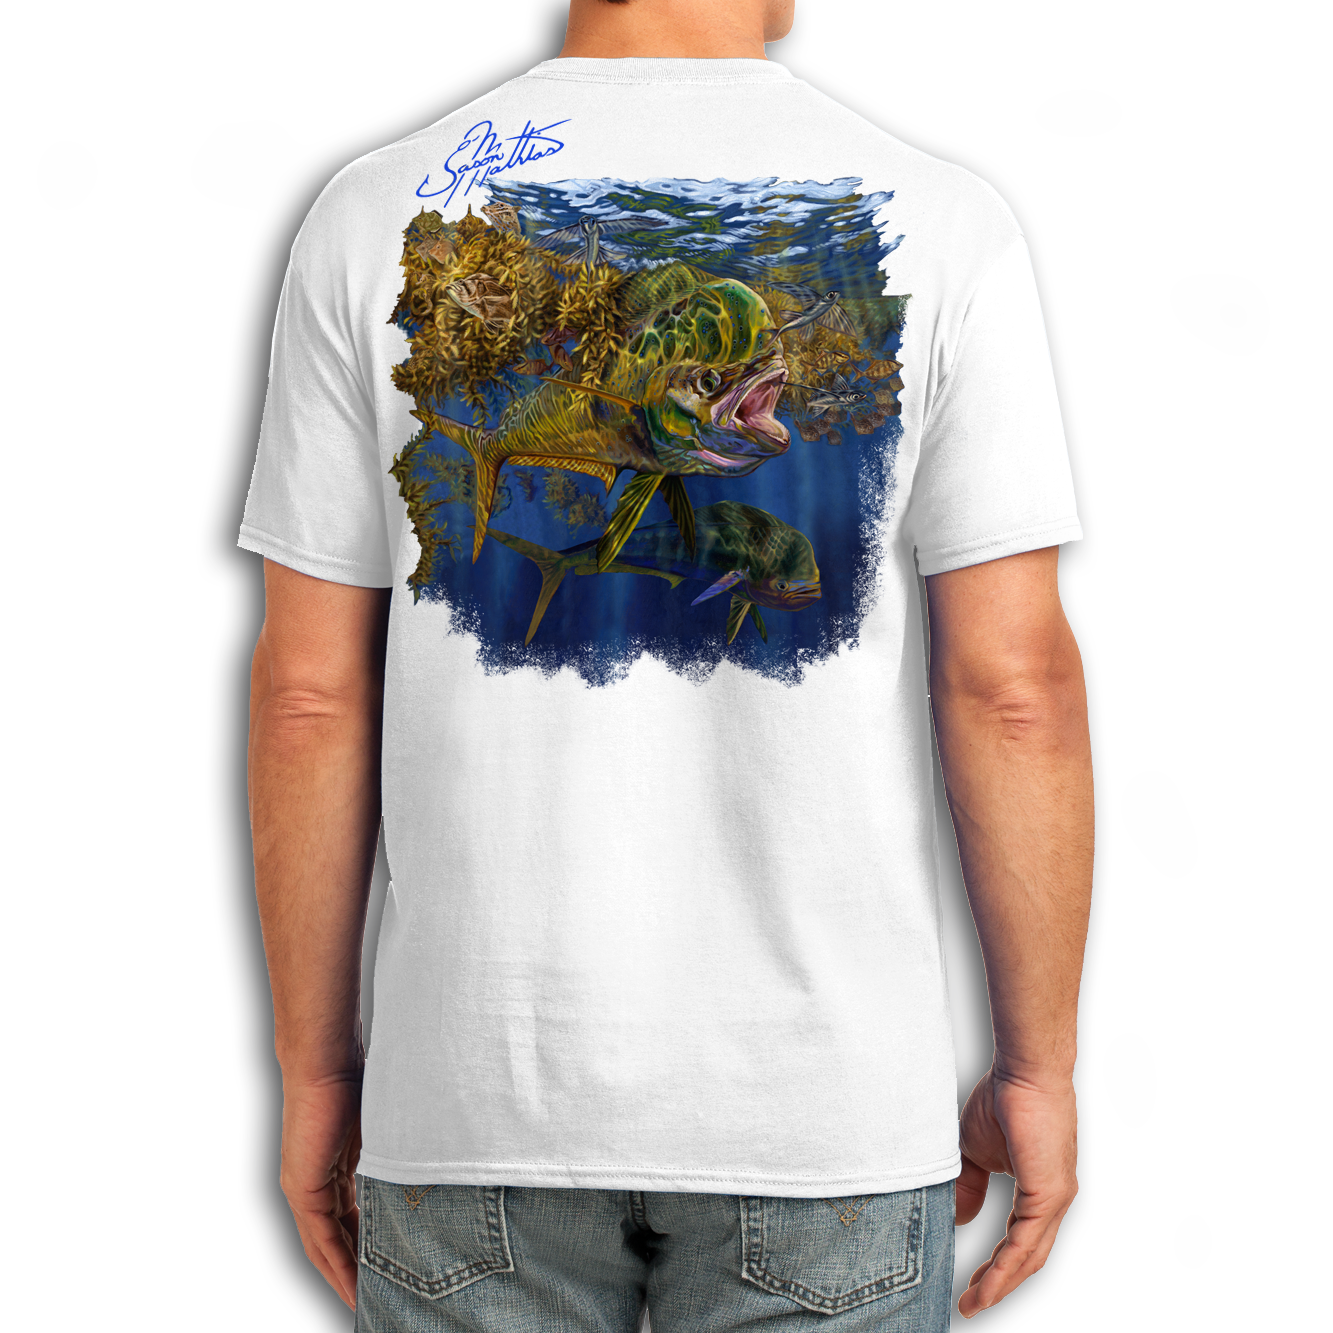 t-shirt-short-sleeve-white-jason-mathias-art-mahi-dorado-dolphin-offshore.png